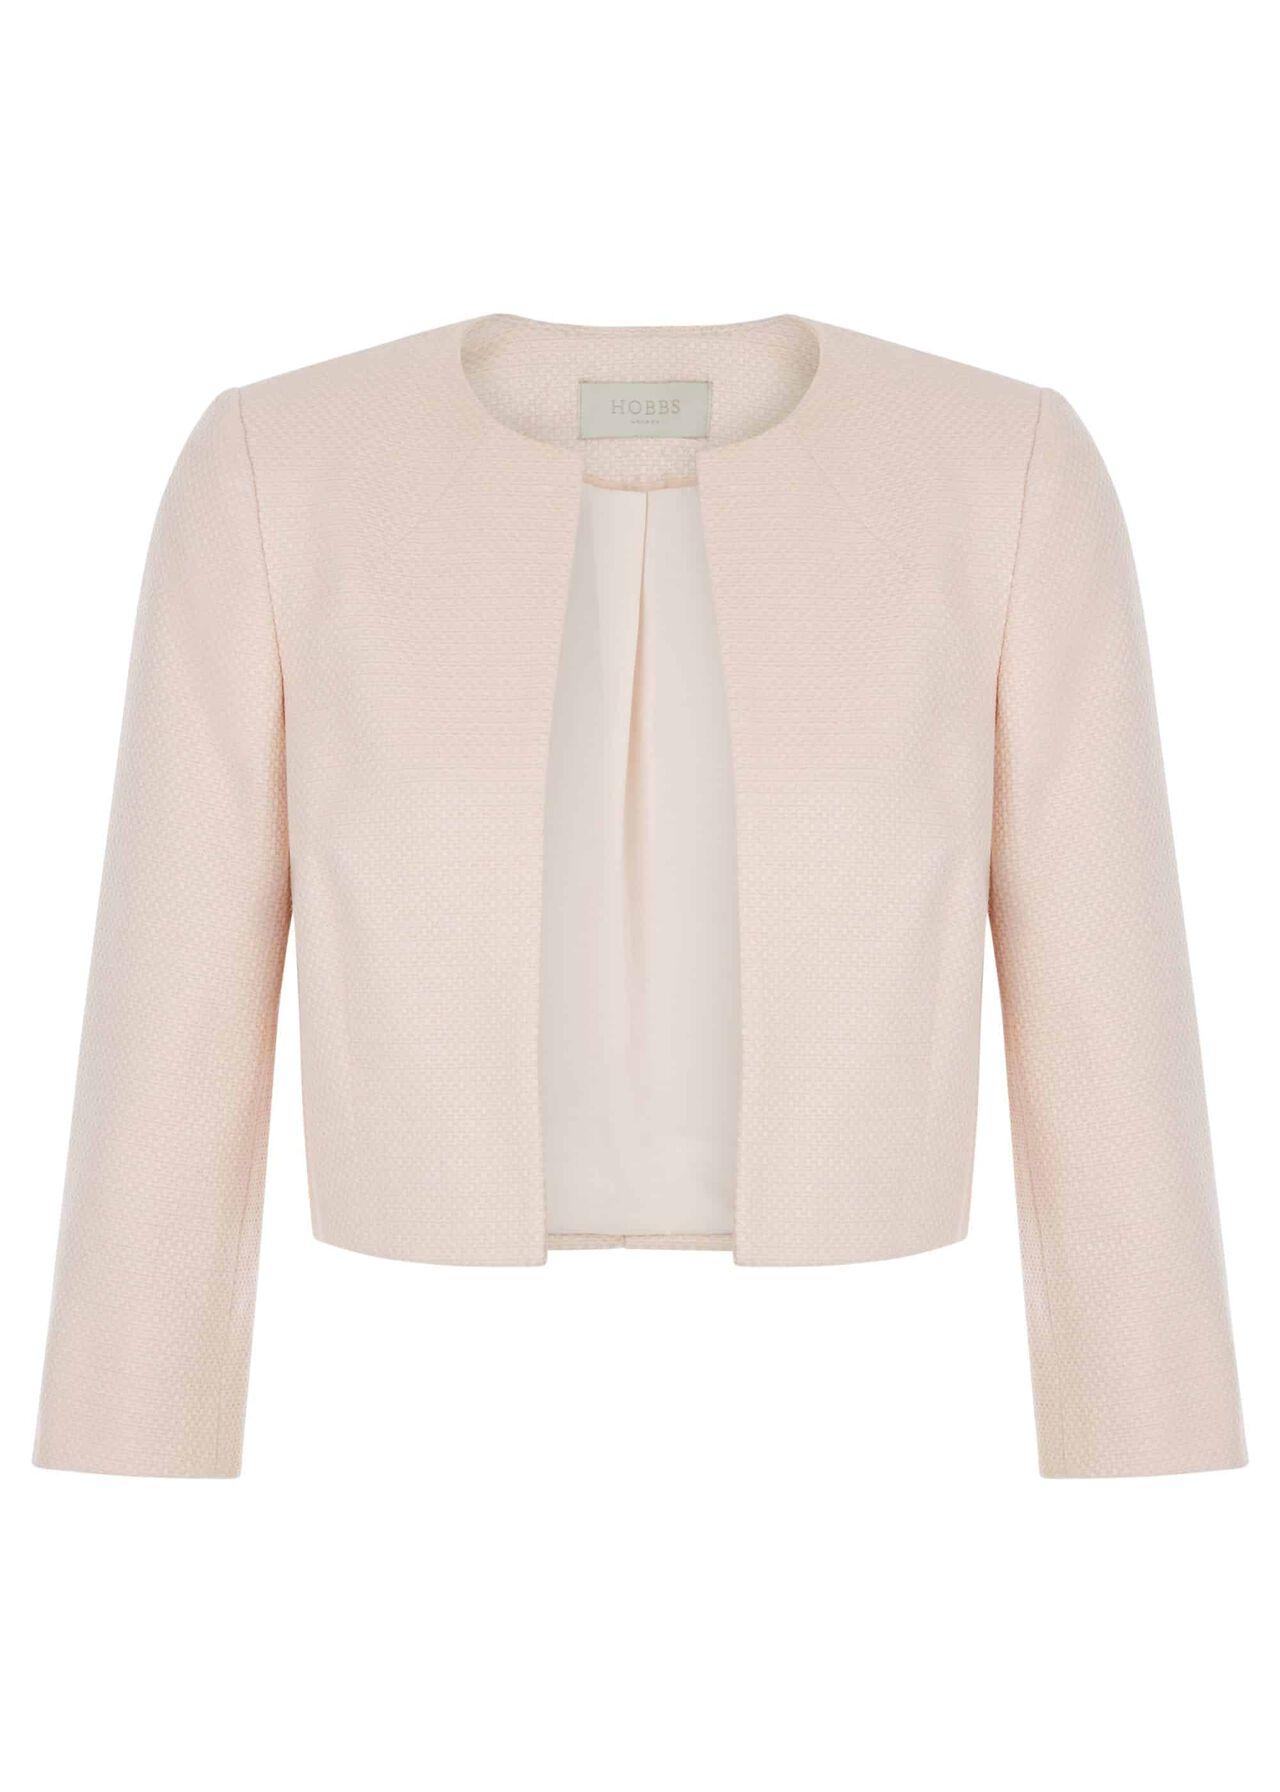 Arizona Jacket Pink